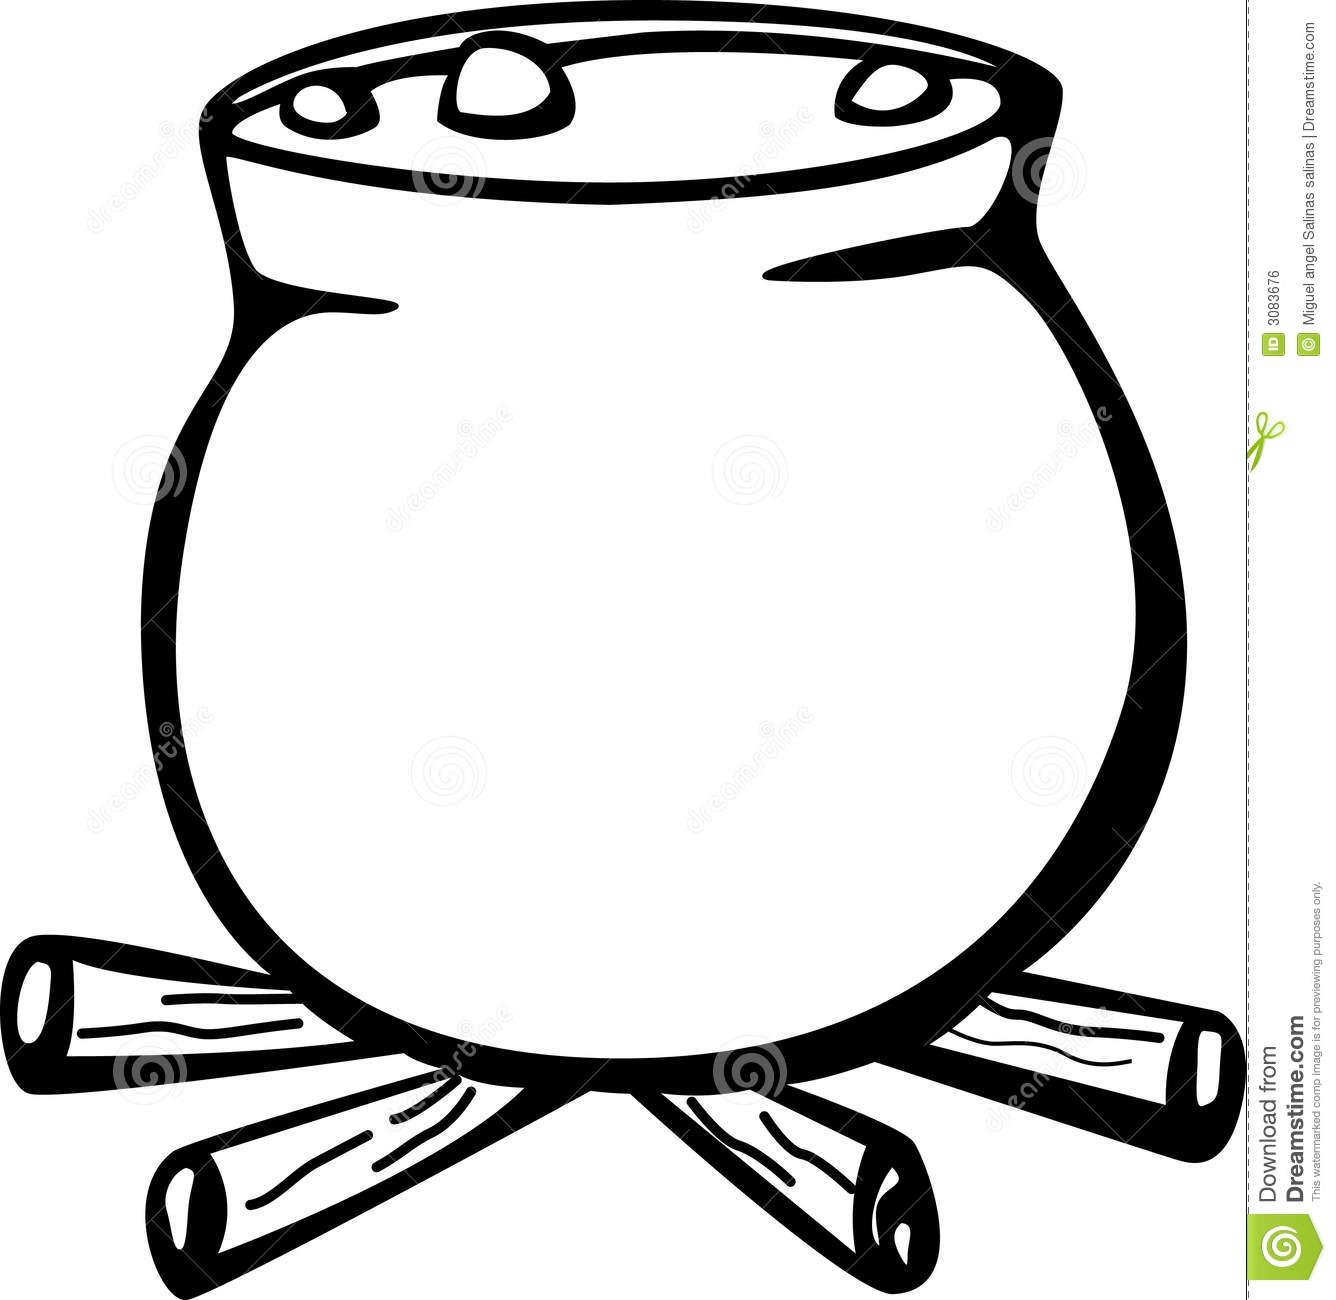 witch cauldron clip art clipart panda free clipart images rh clipartpanda com witch cauldron clipart cauldron clipart black and white